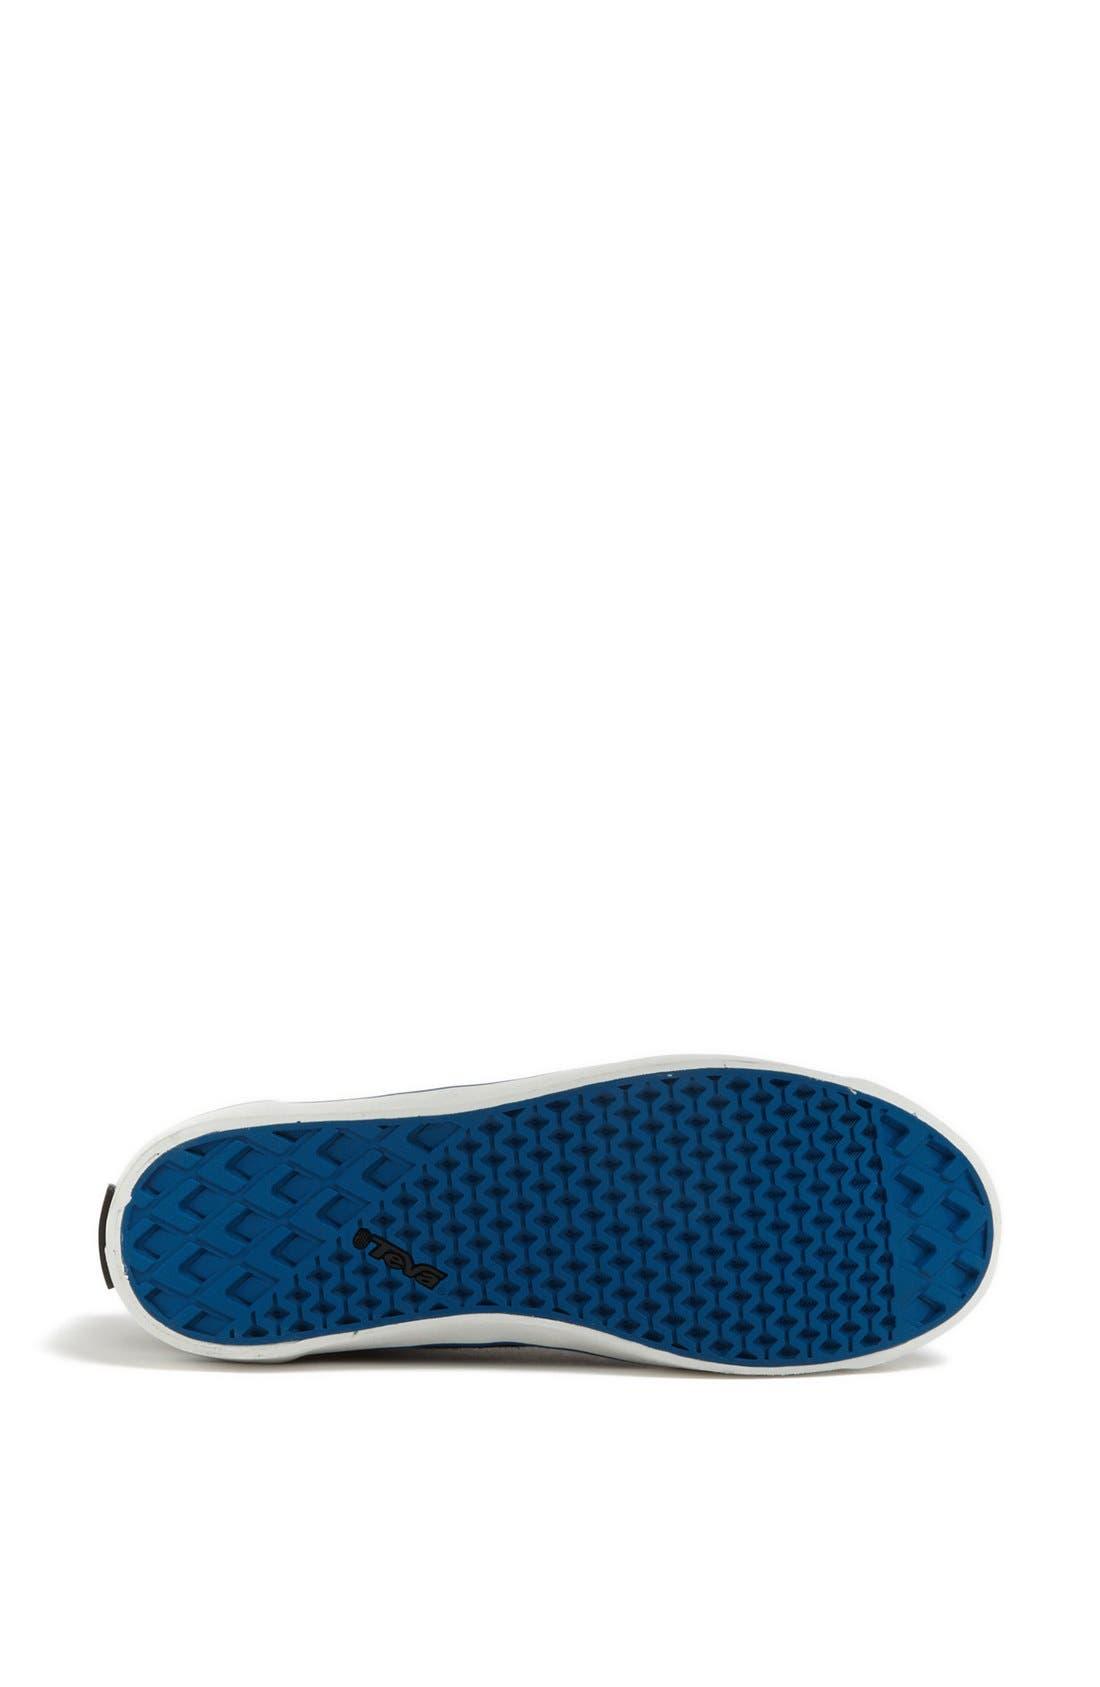 'Freewheel' Sneaker,                             Alternate thumbnail 4, color,                             002